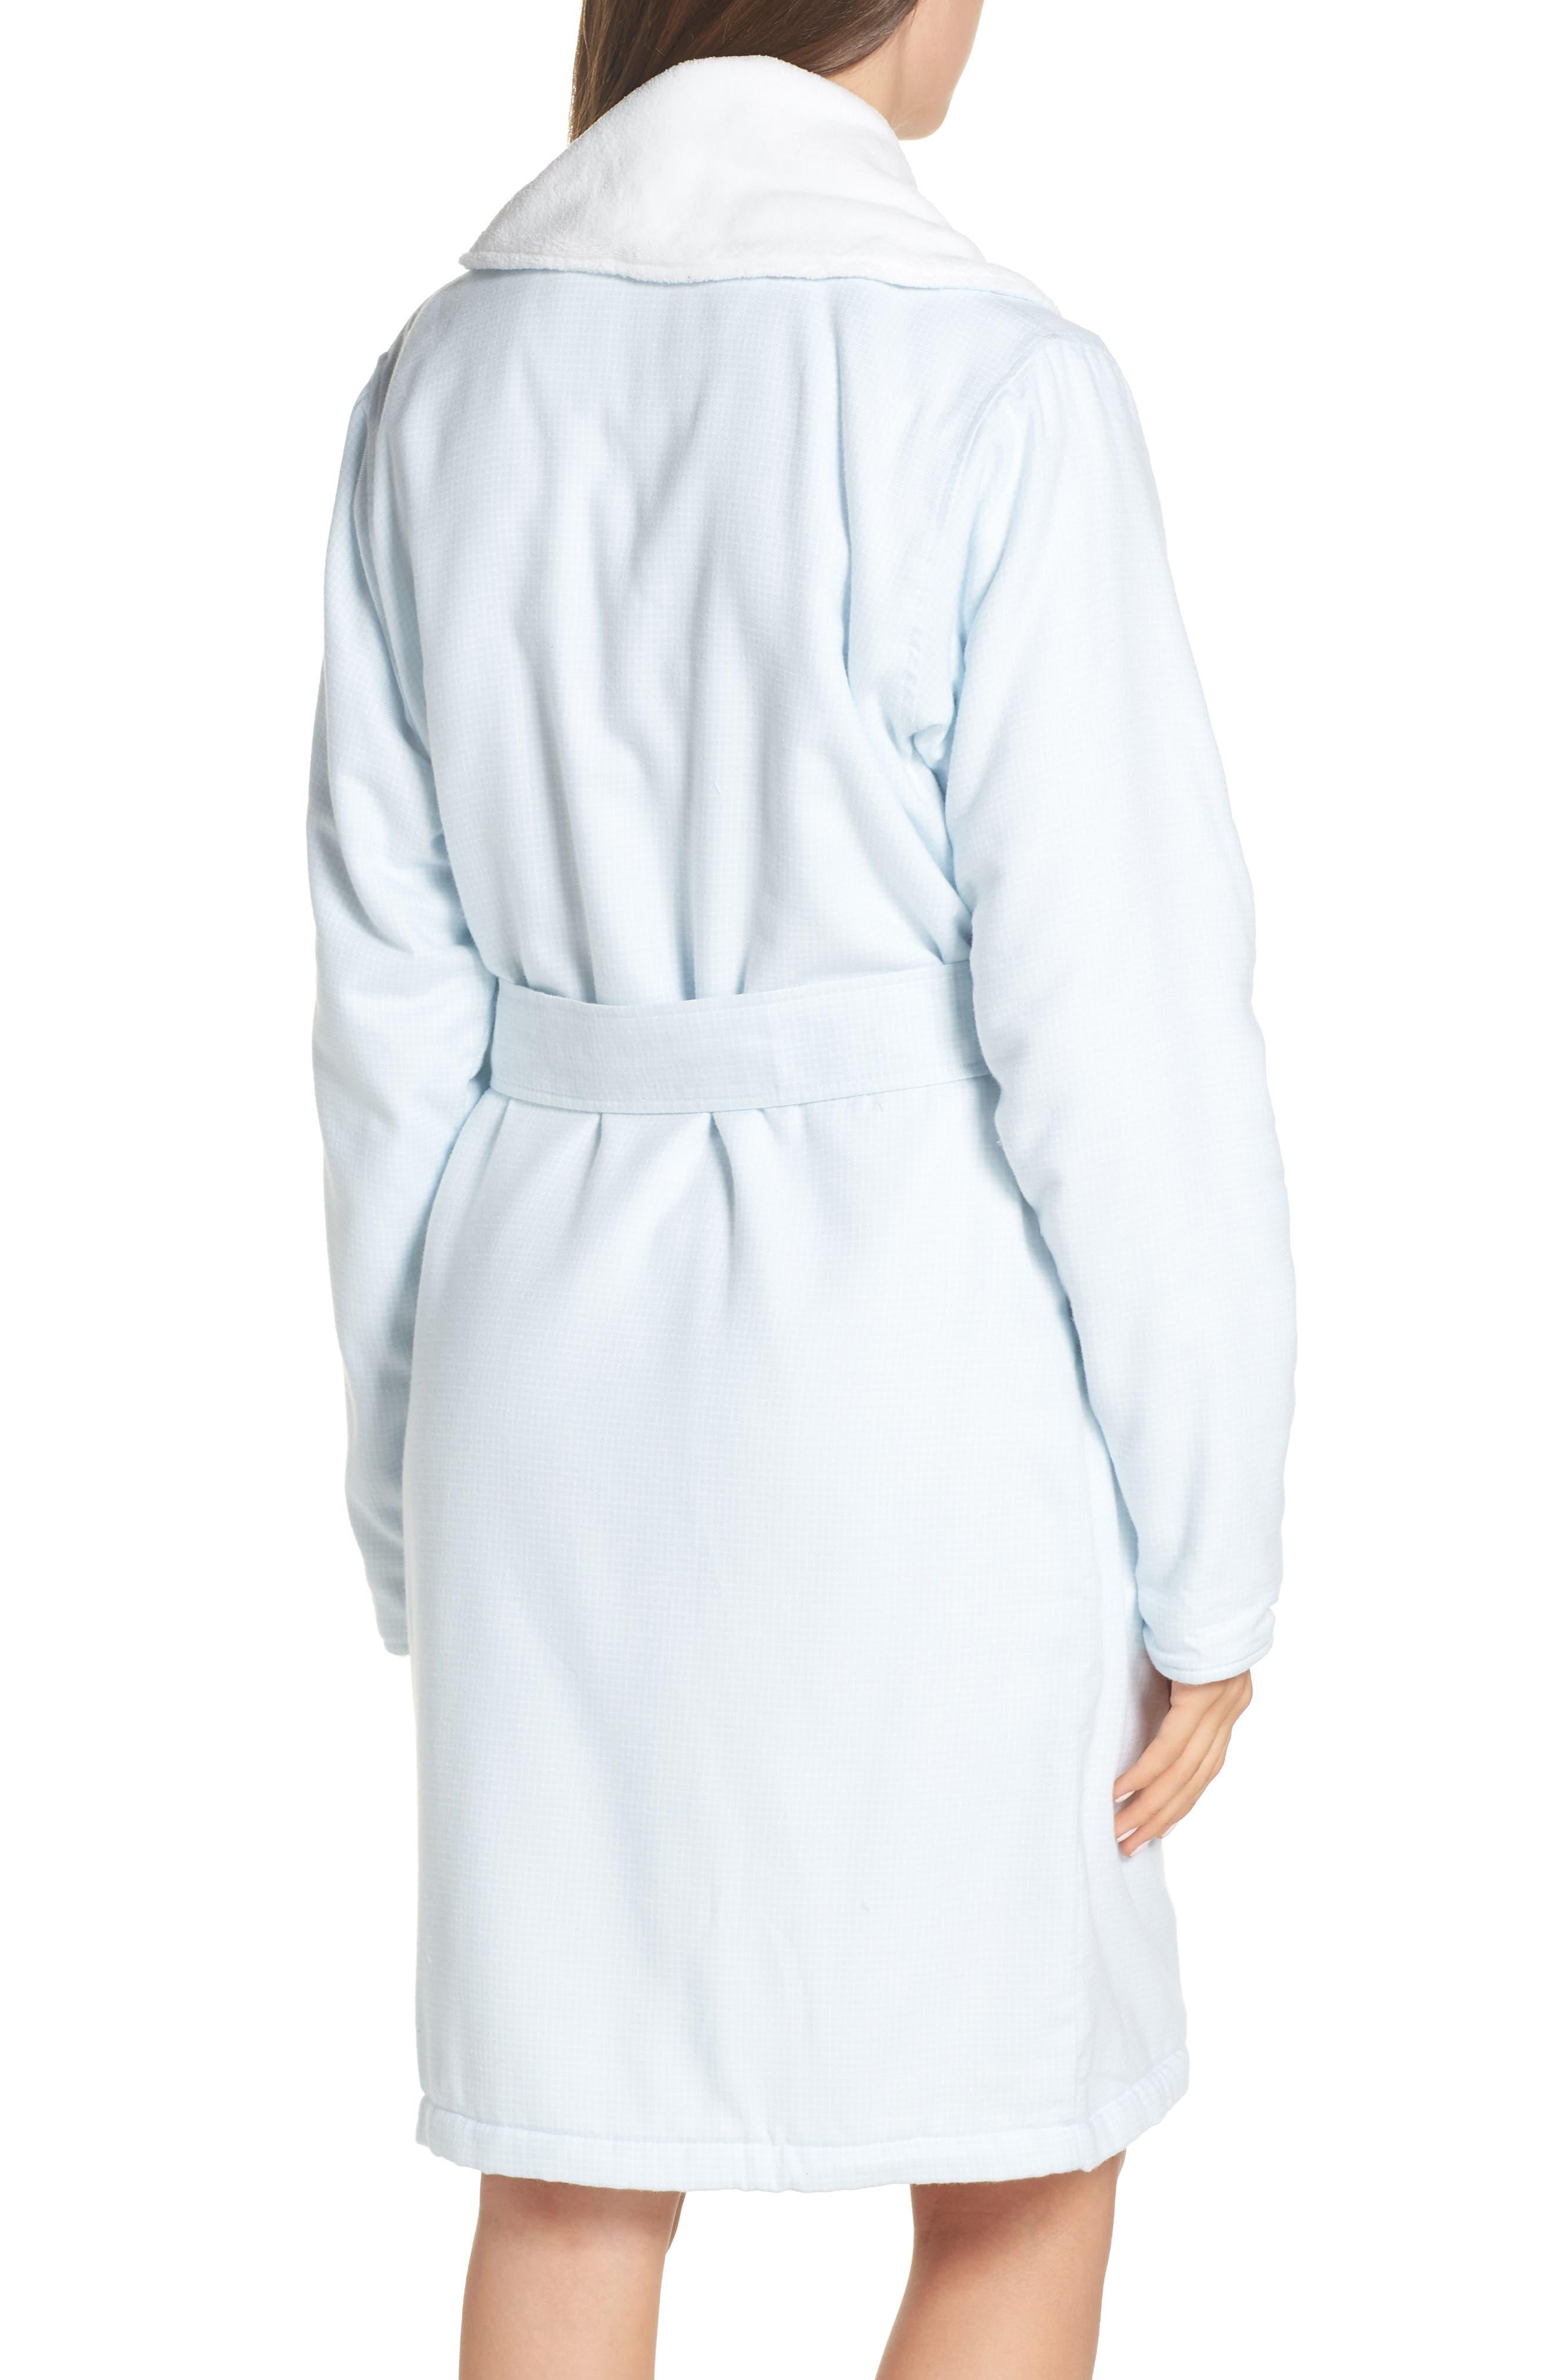 Anika Fleece Lined Flannel Robe,                             Alternate thumbnail 2, color,                             SKY BLUE / WHITE CHECK